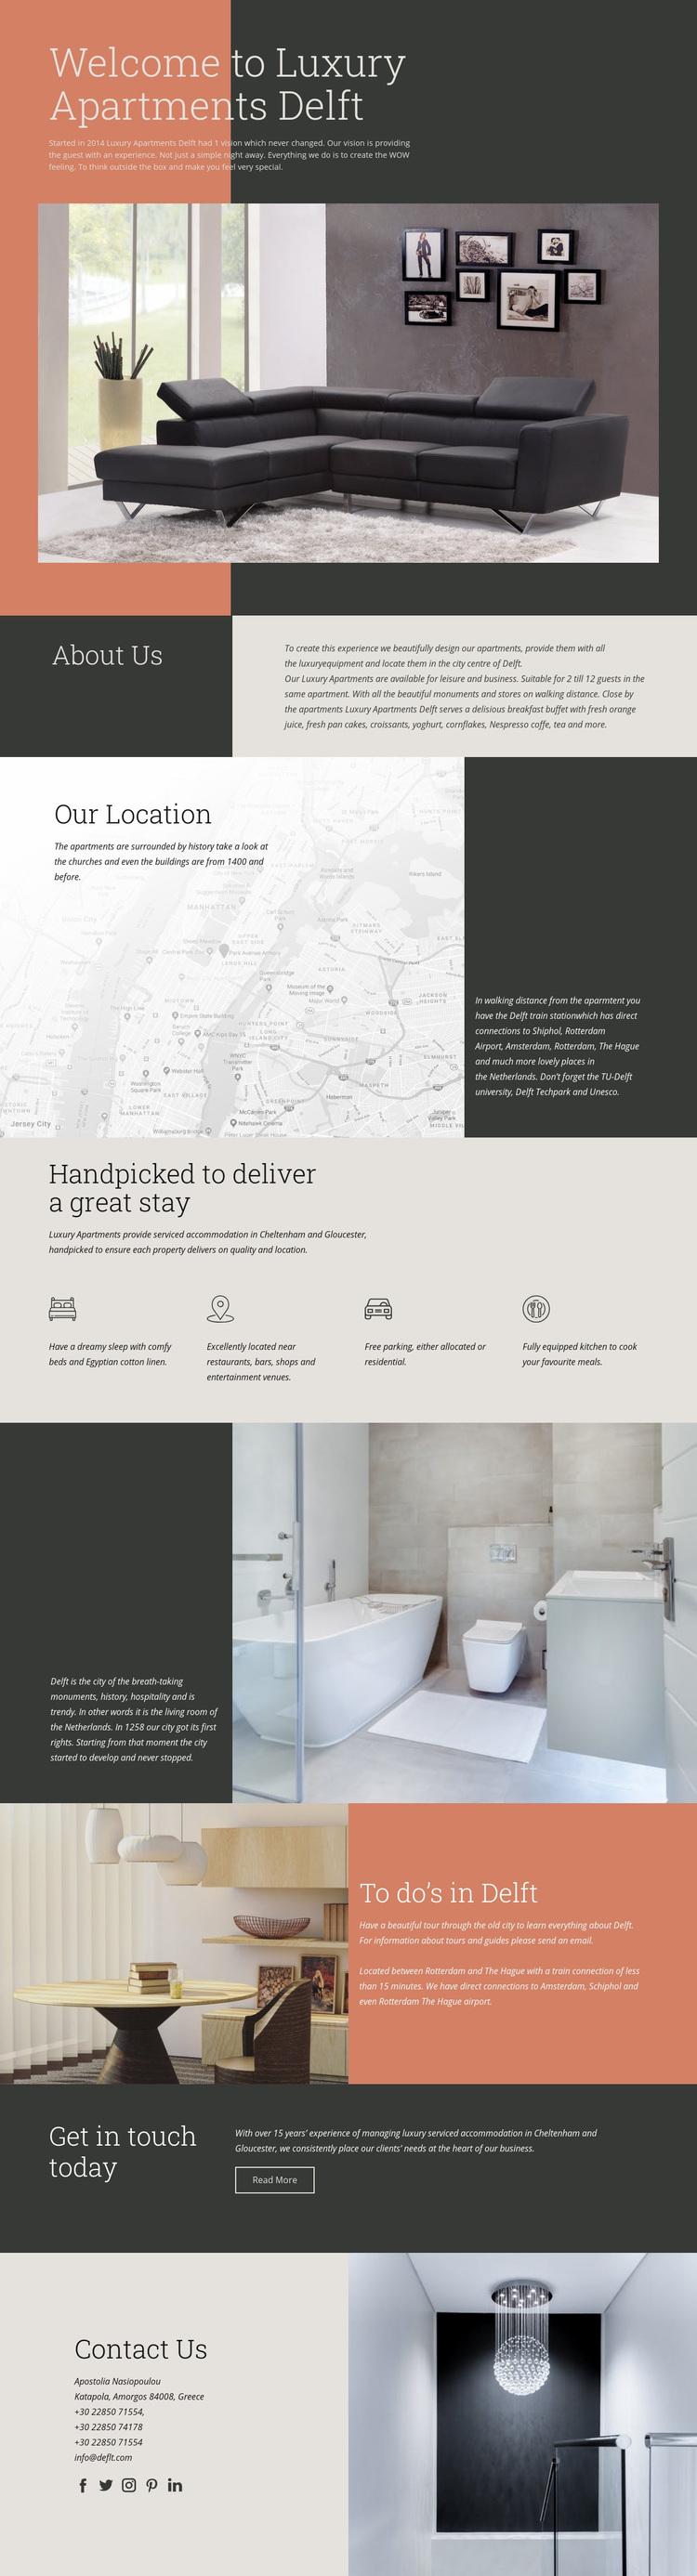 Luxury Apartments Web Page Designer